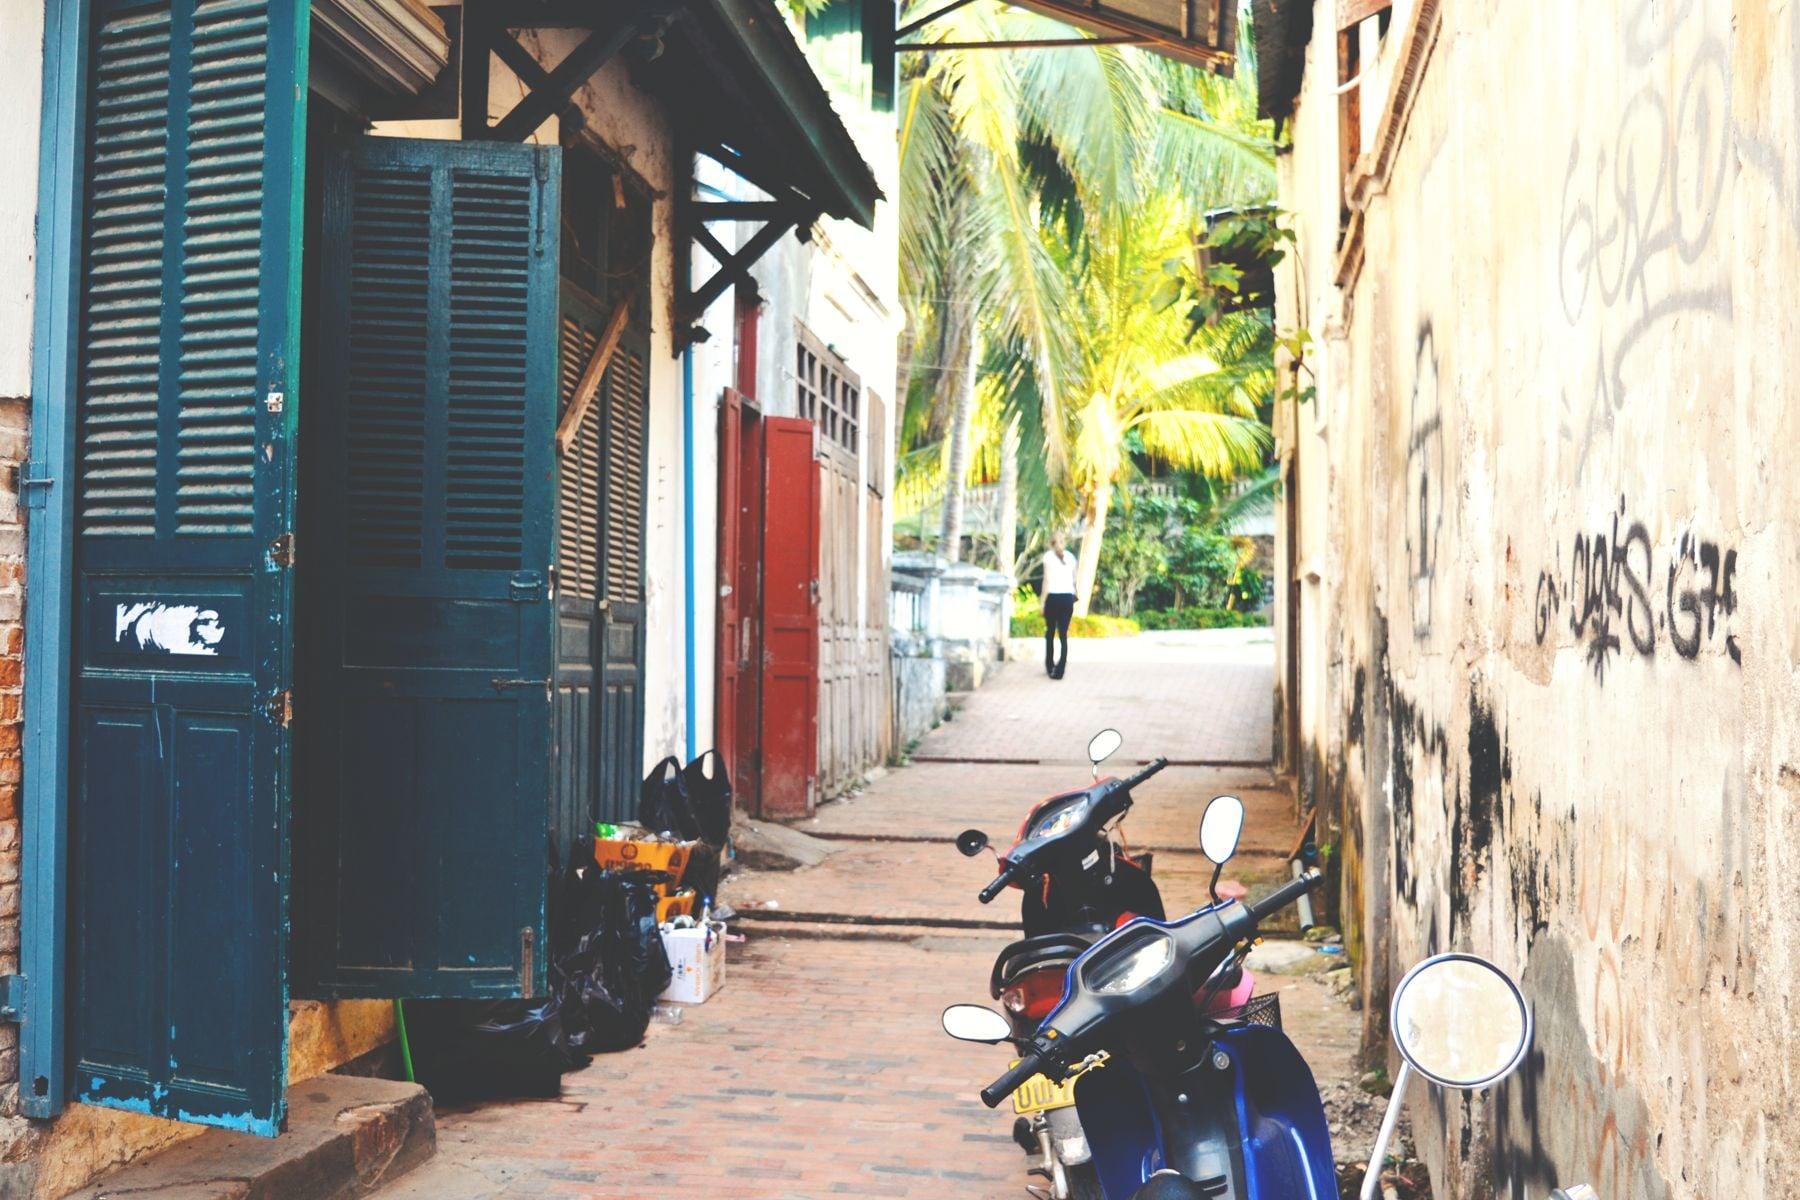 European-feeling Luang Prabang, Laos.A beautiful UNESCO heritage site